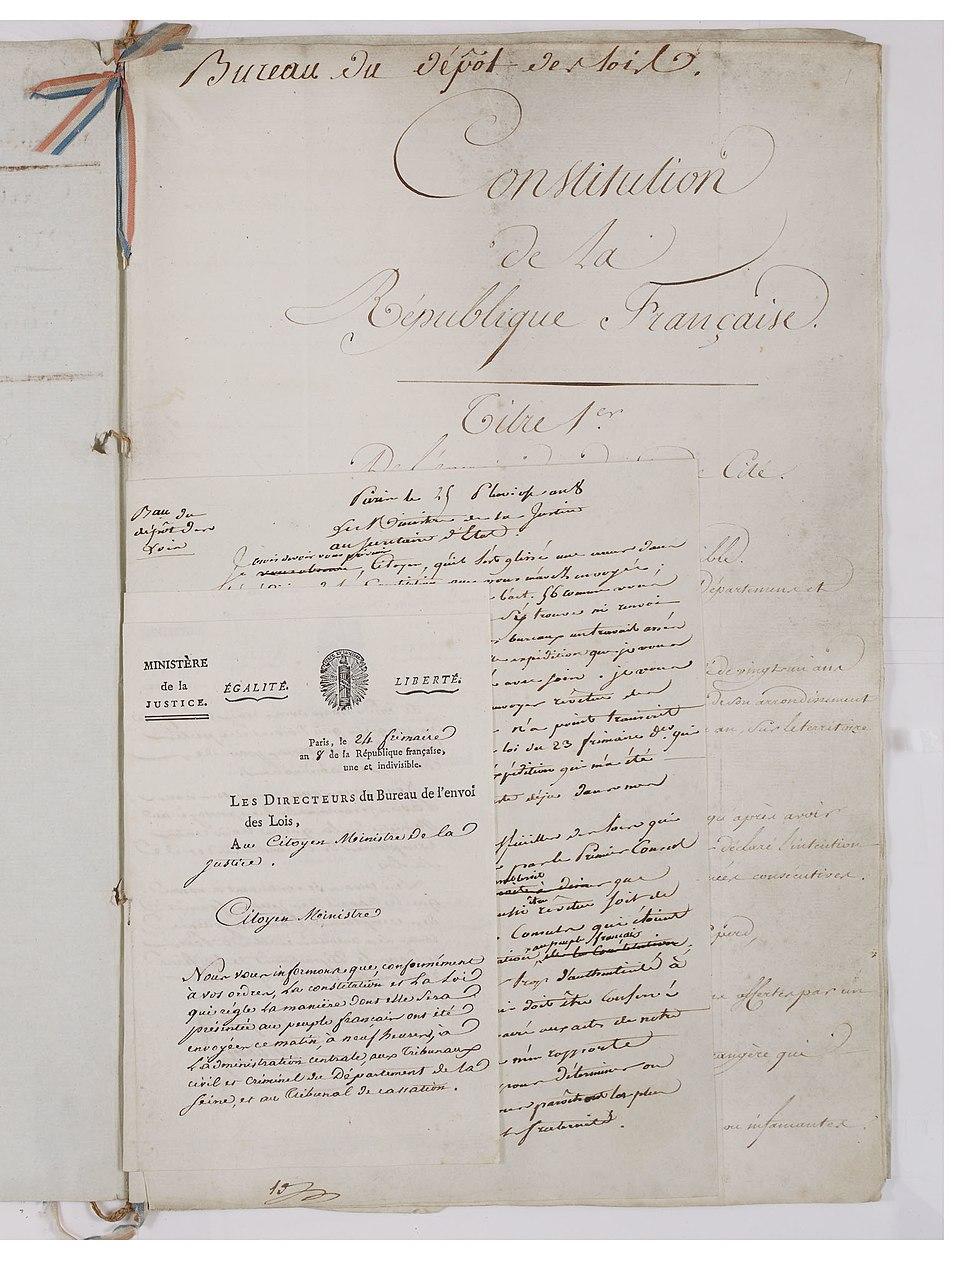 Constitution du 22 frimaire an VIII (13 décembre 1799). Page 3 - Archives Nationales - AE-I-29-4